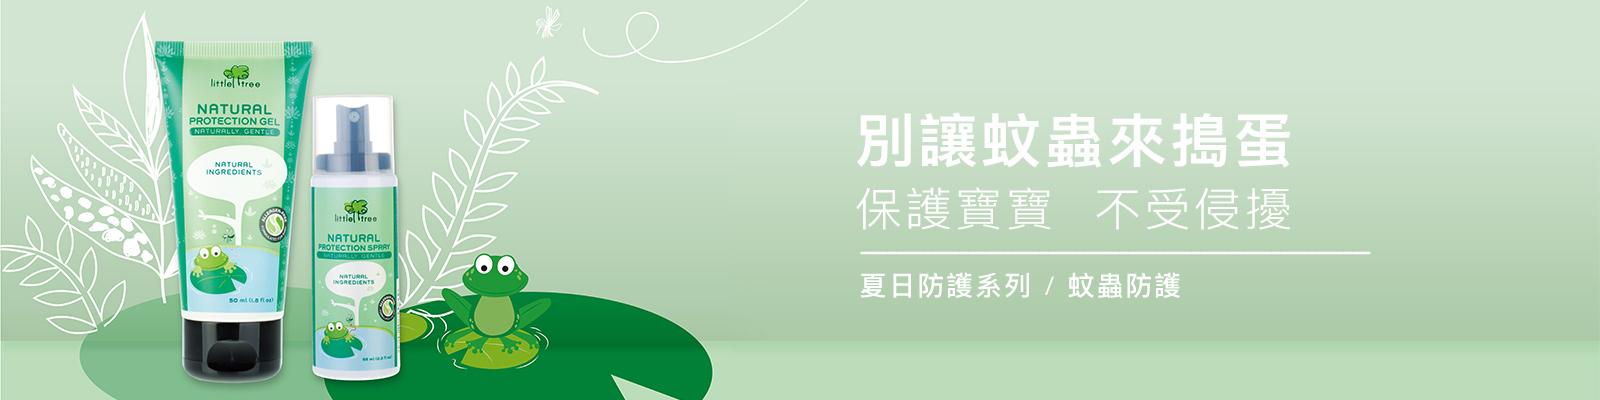 Desktop Banner for Jual Produk Perlindungan Kulit Bayi Hingga Lotion Anti Nyamuk Bayi Murah